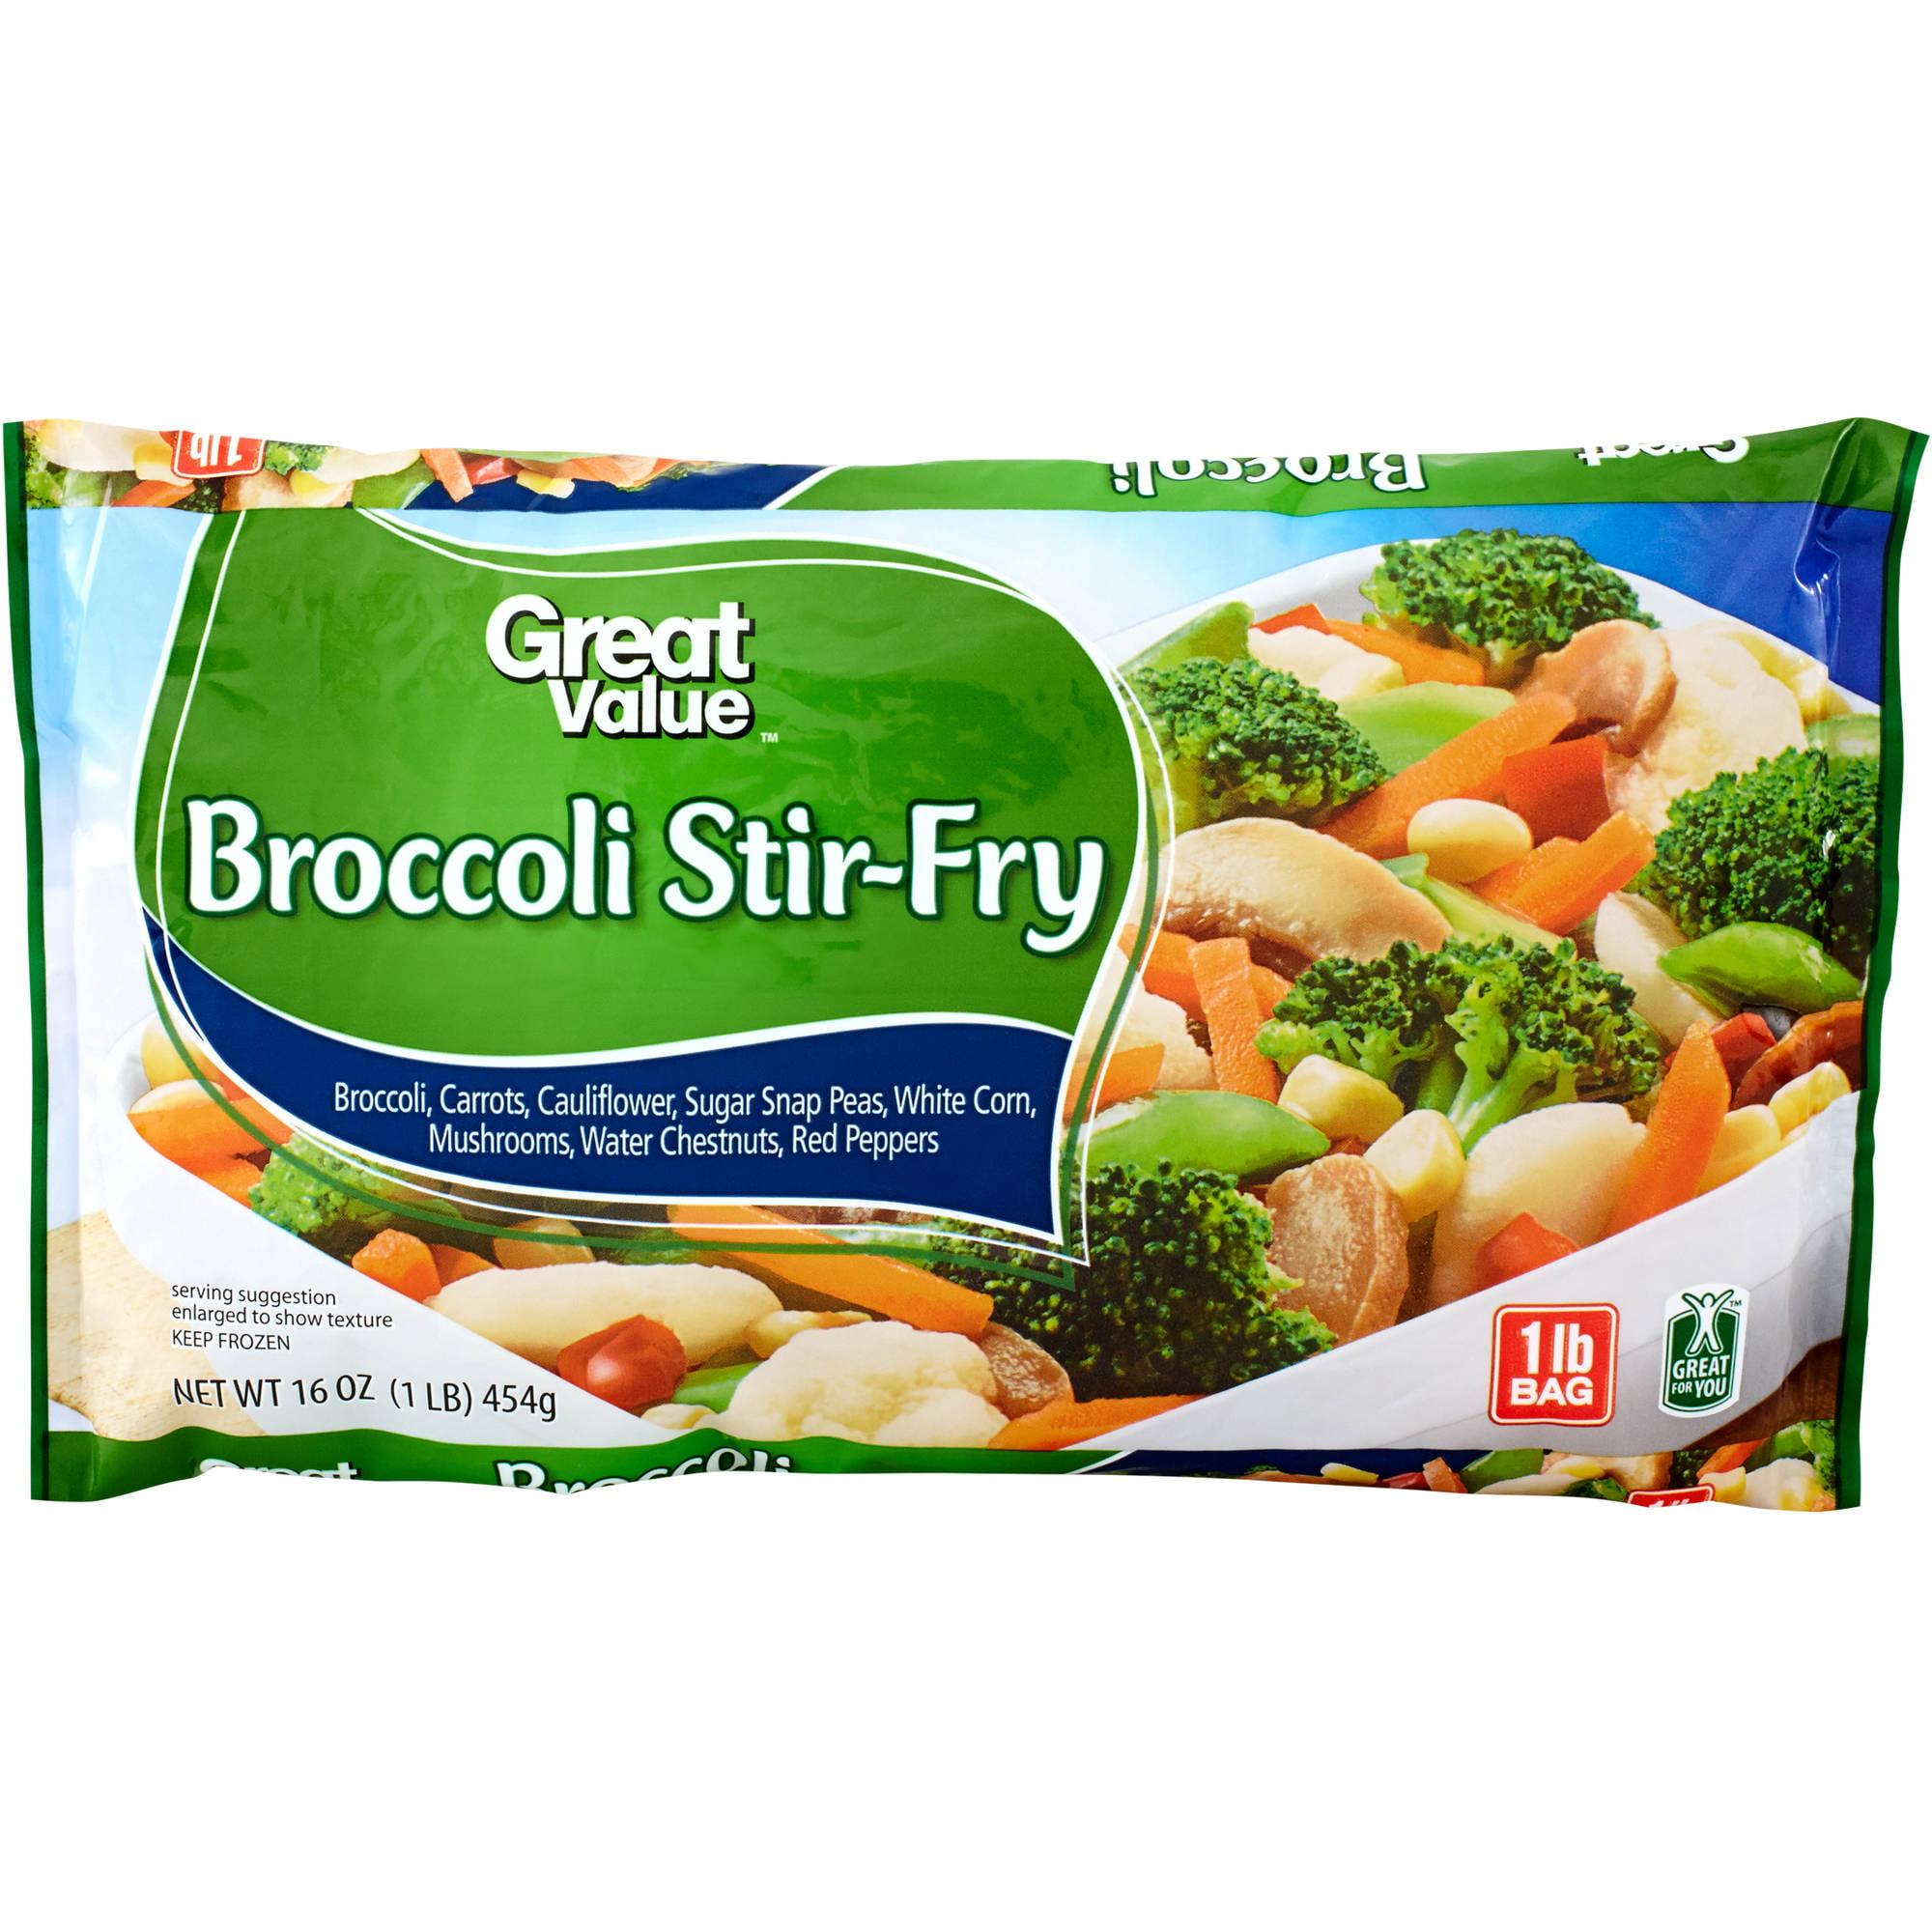 Great Value: Broccoli Stir-Fry, 16 Oz